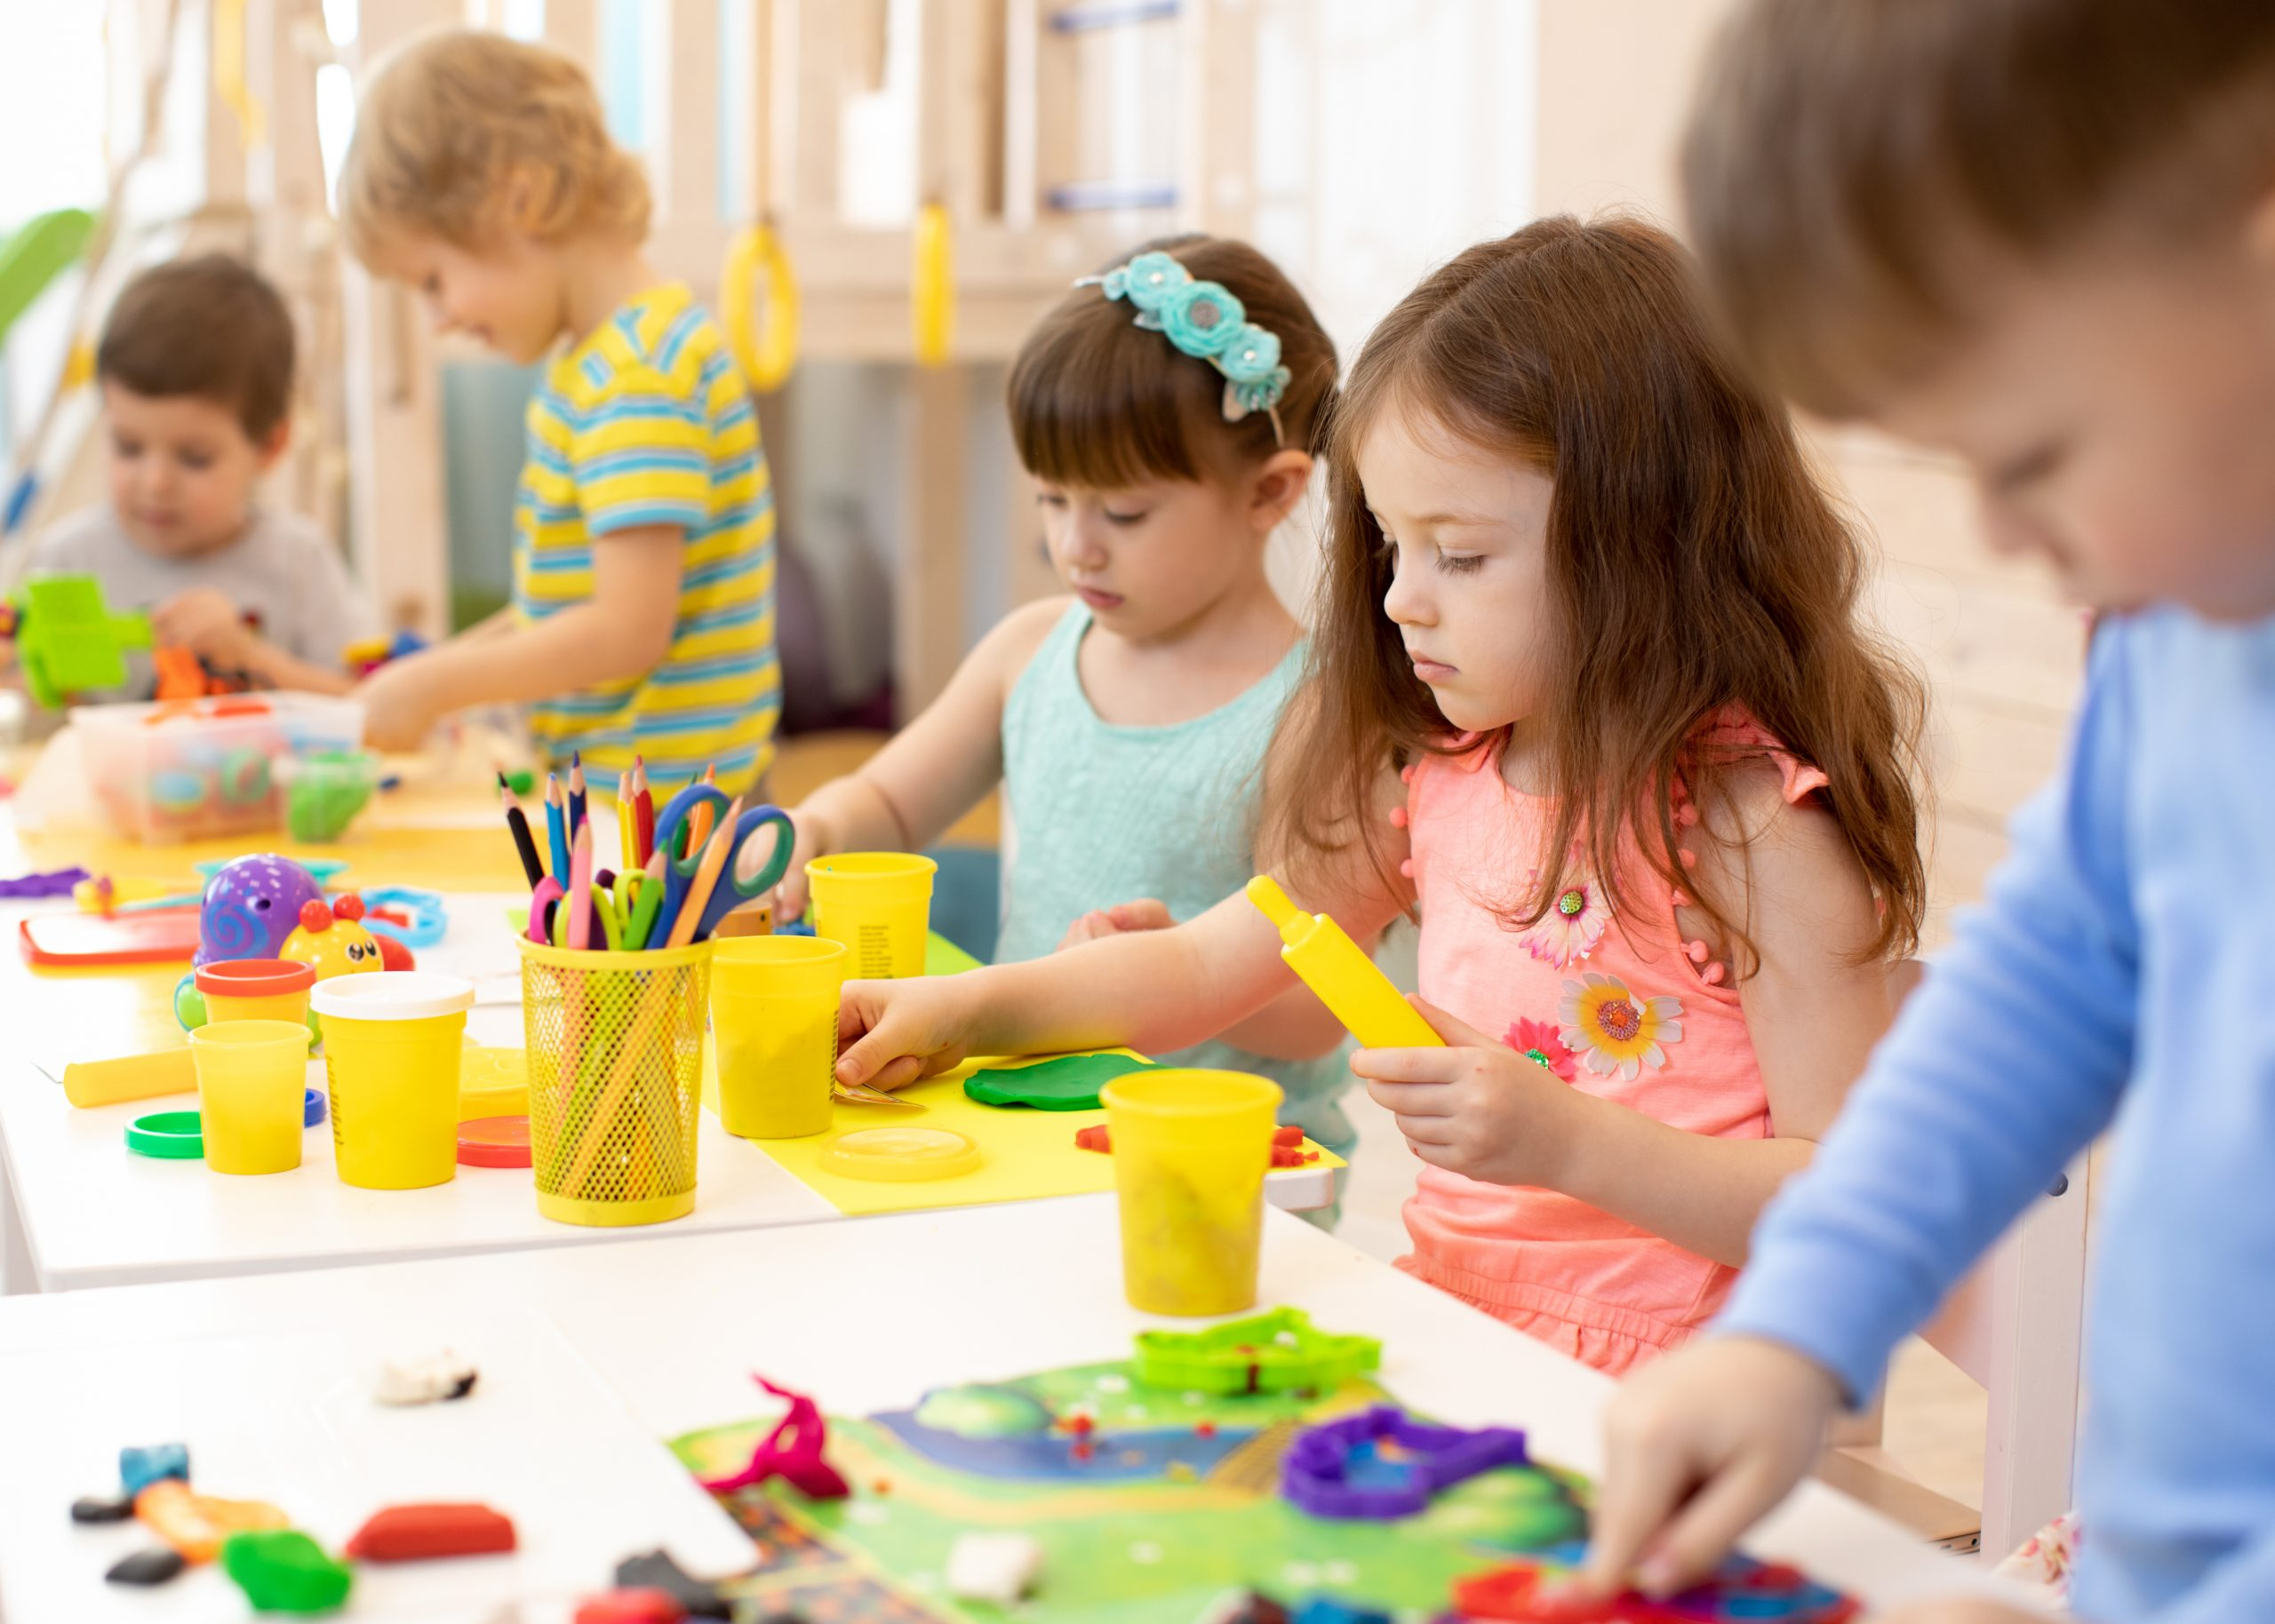 Art and craft activity in kindergarten. Preschool kids hands working in day care center. Group of children engaged in handcrafts